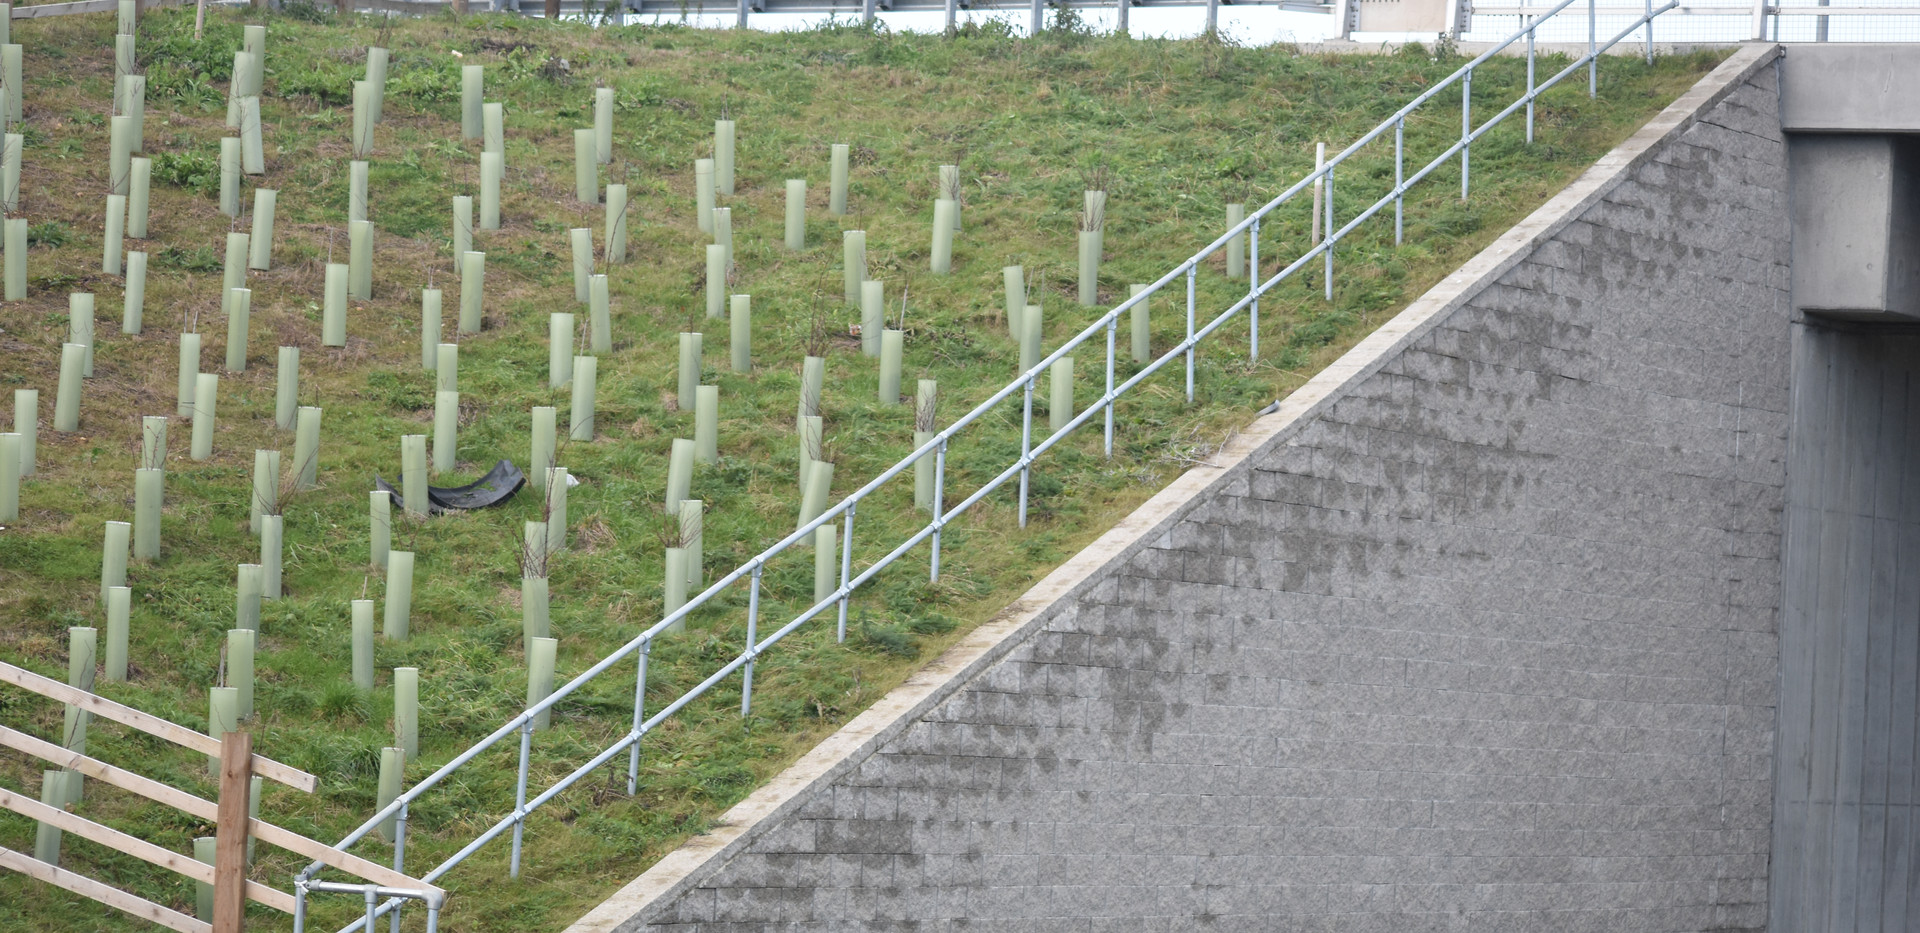 KITE Projects - M1 J23 - KITE Clamp Handrailing